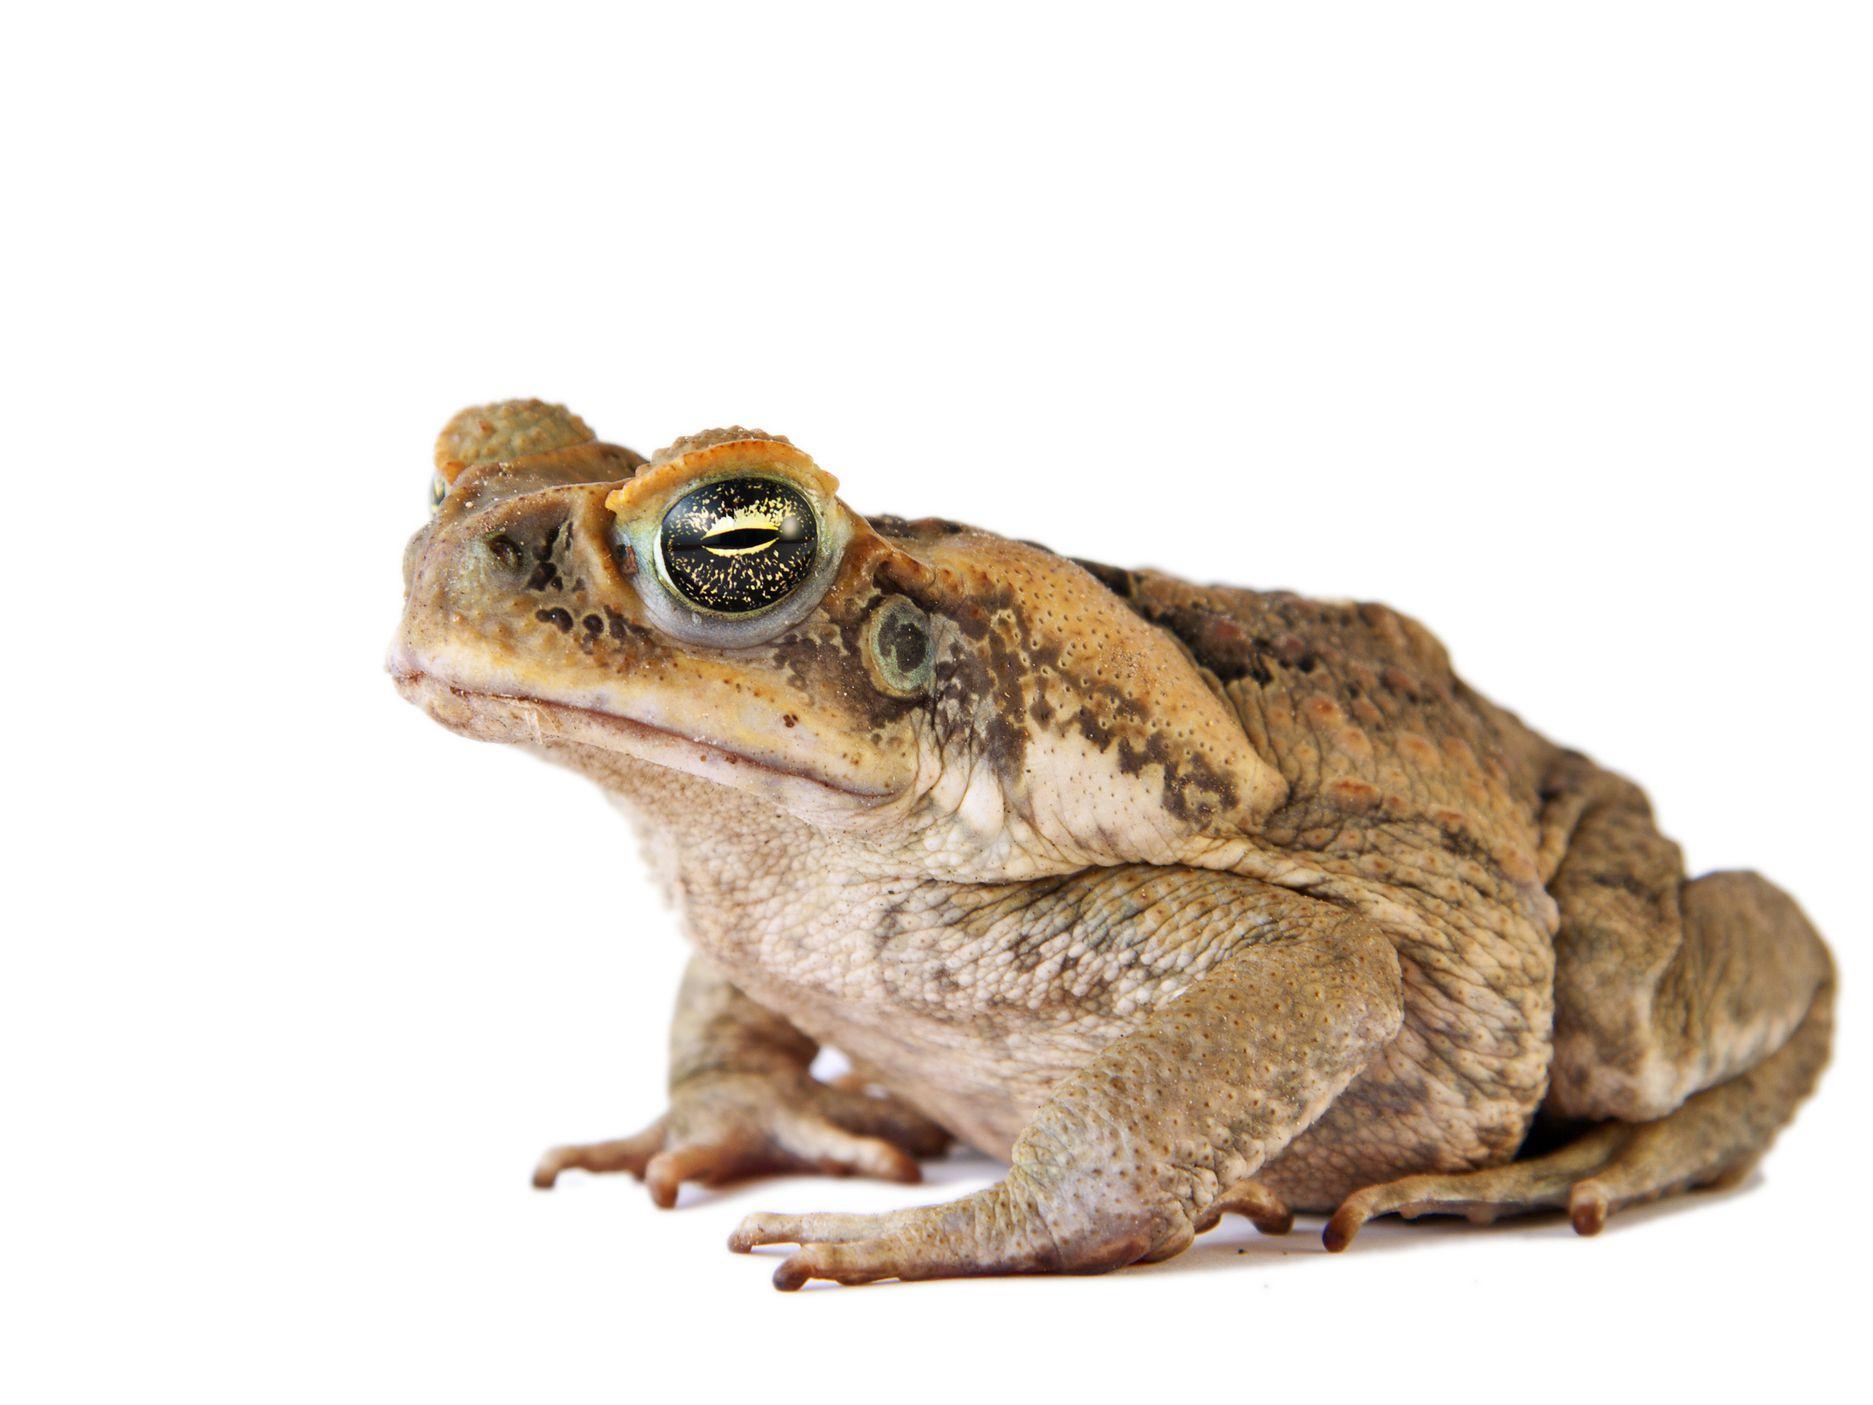 Cane Toad Facts Rhinella Marina